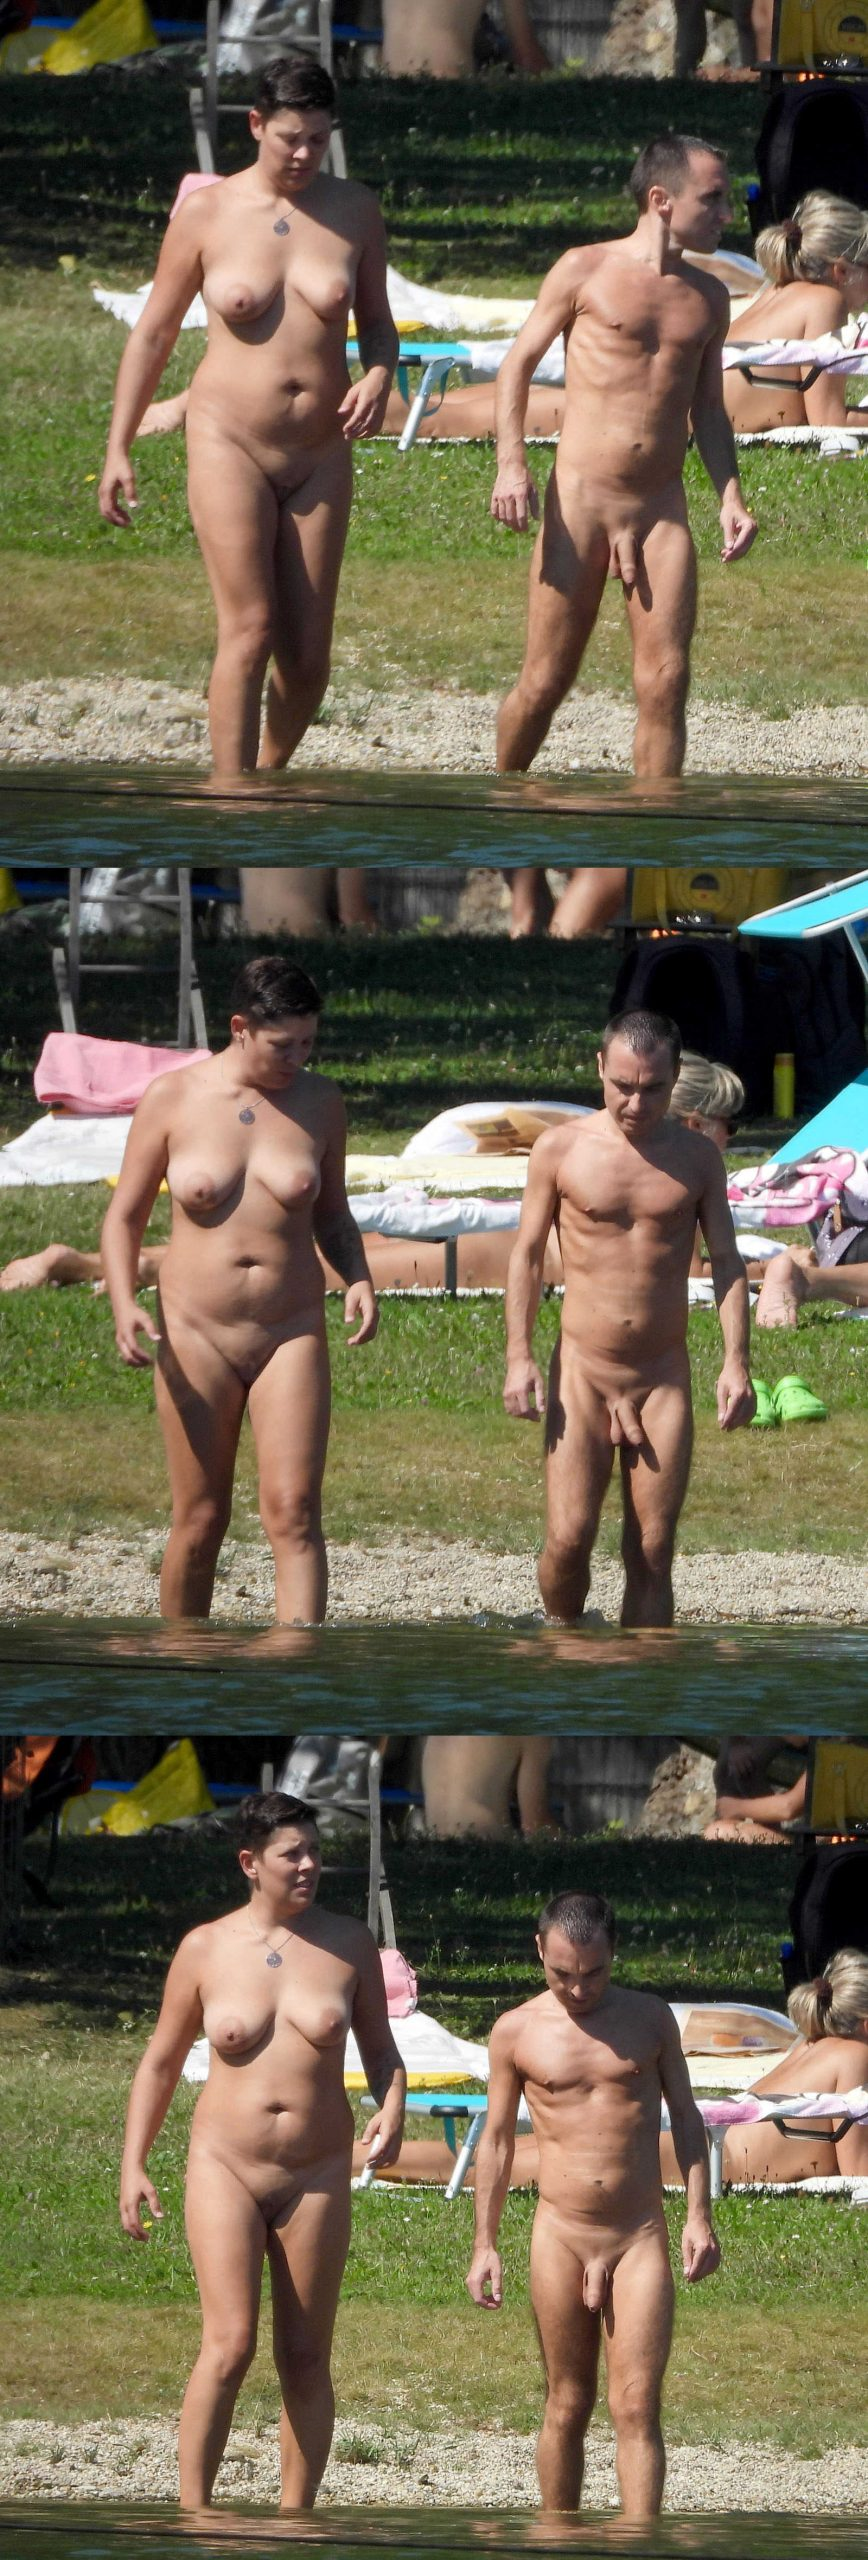 straight nudist man with big uncut dick